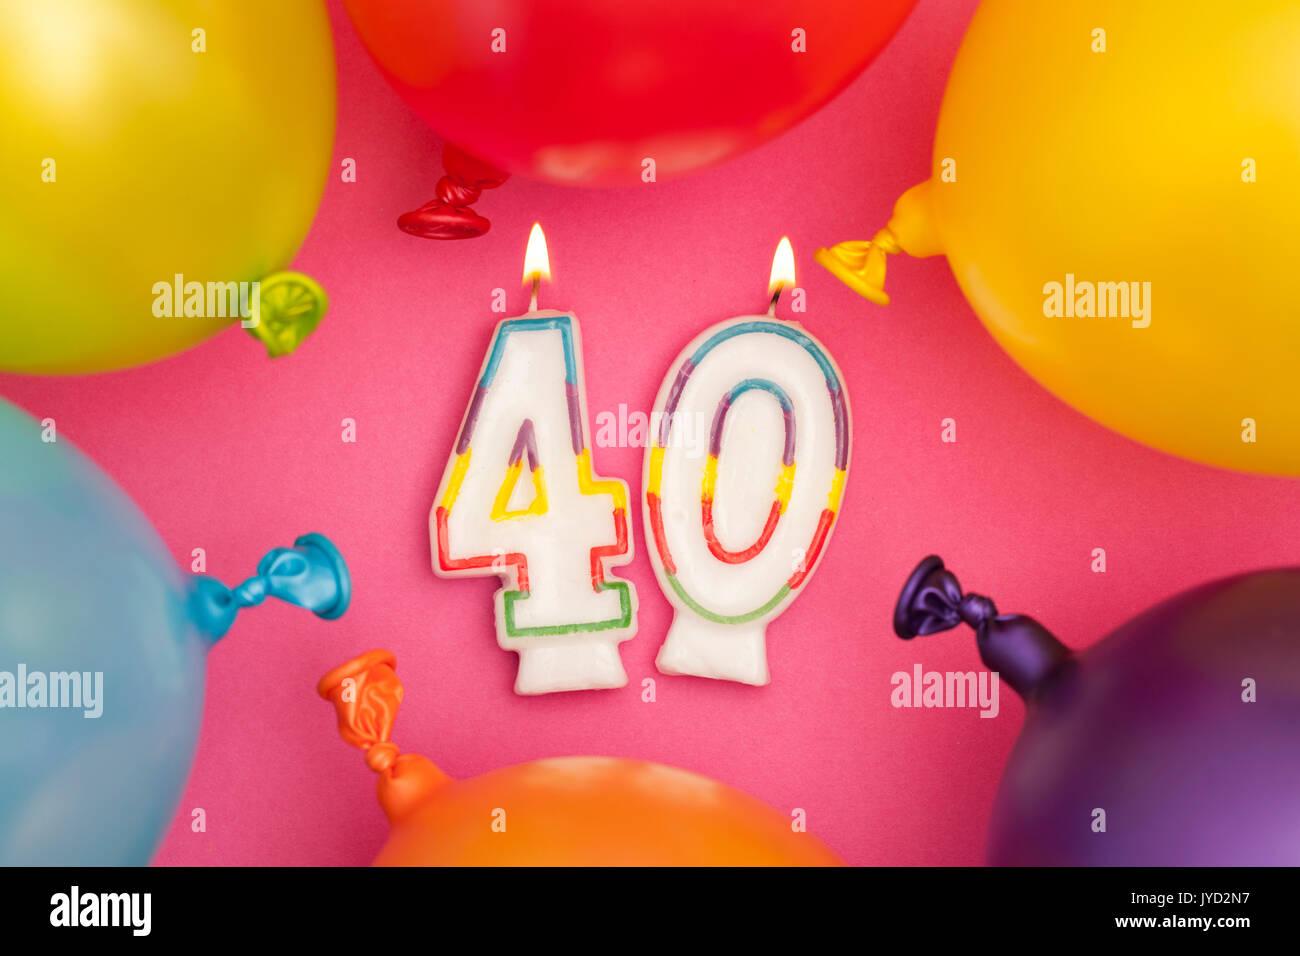 Imagenes De Cumpleanos Numero 40.Feliz Cumpleanos Numero 40 Celebracion Vela Con Globos De